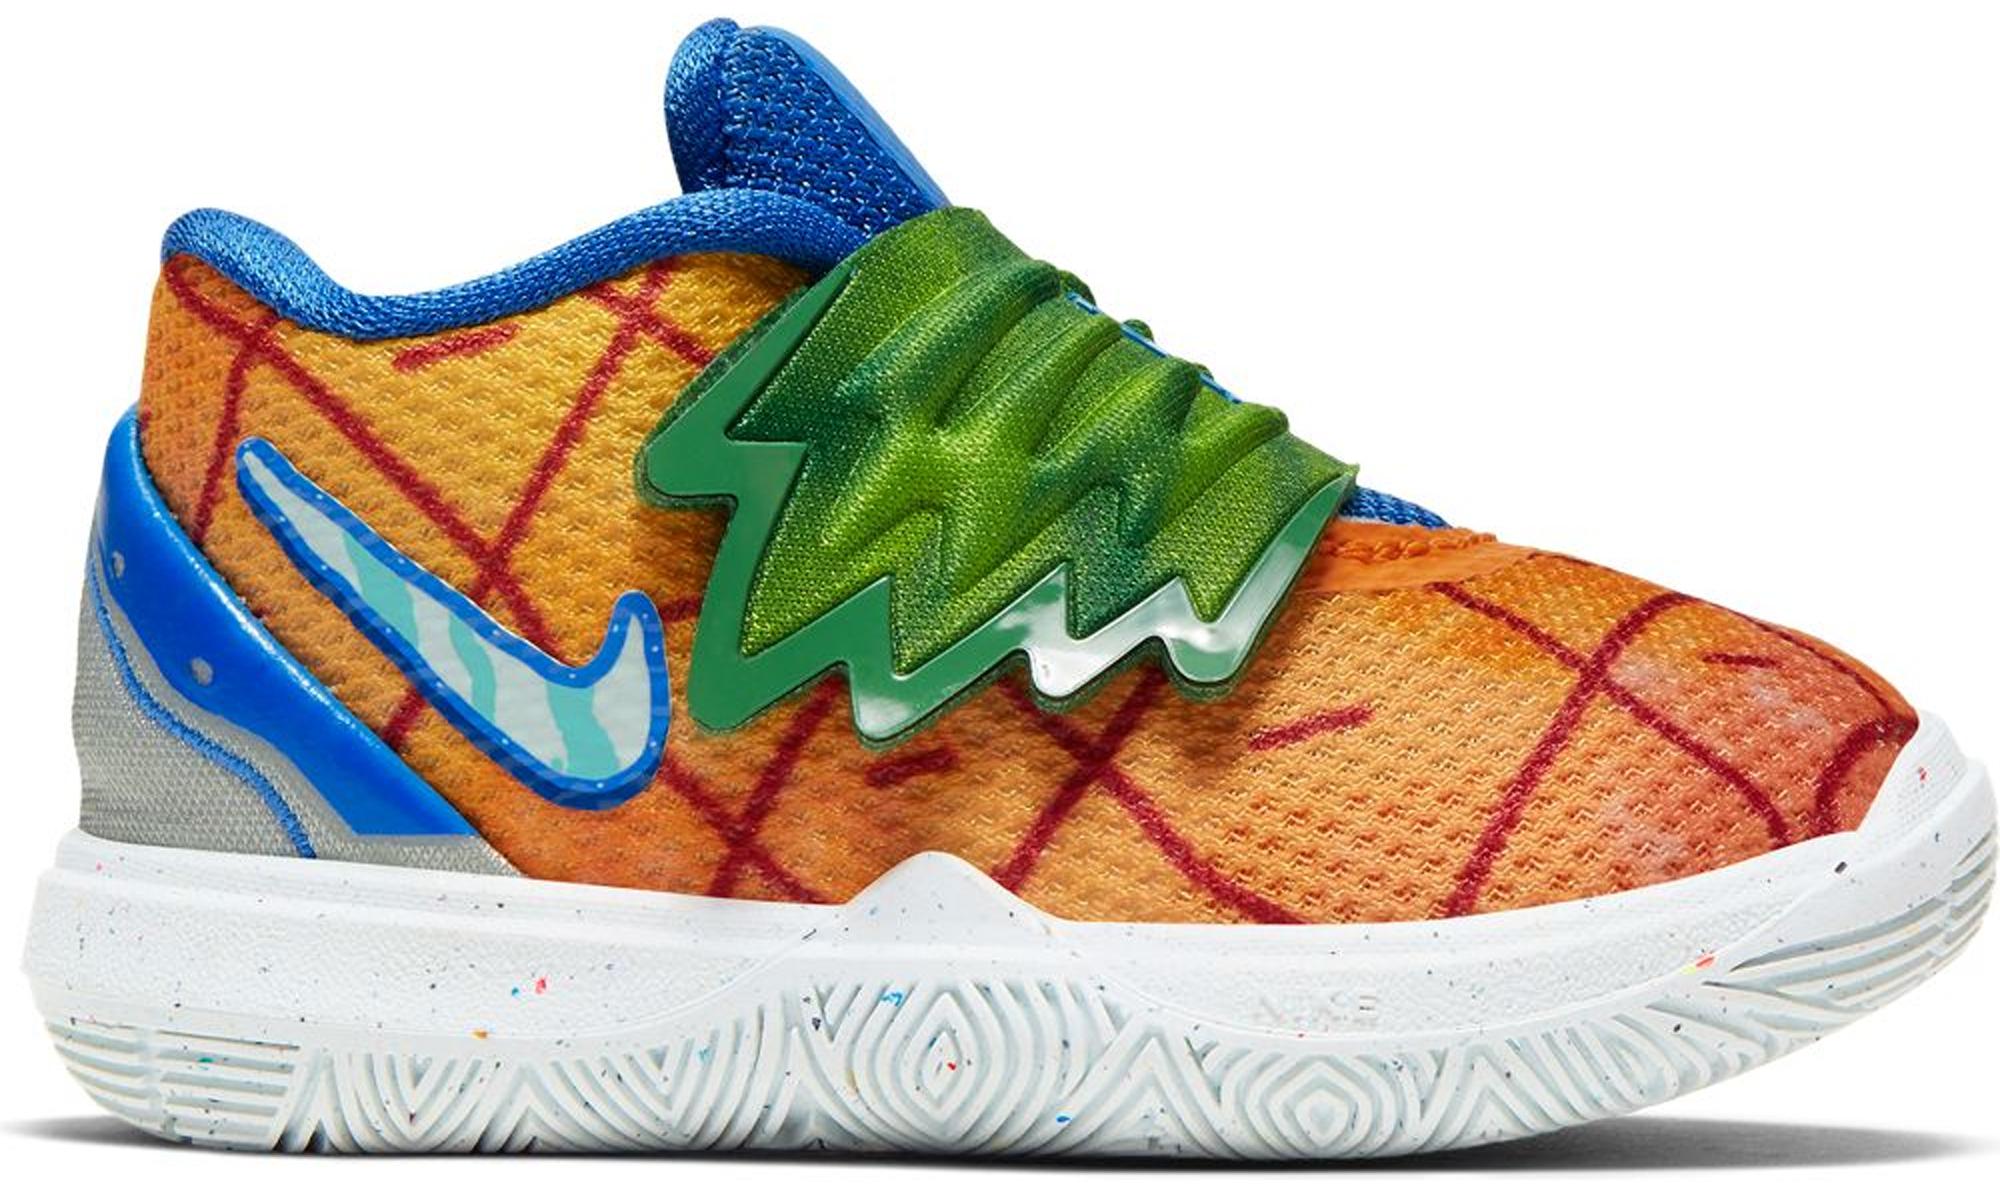 Nike Basketball Kyrie Spongebob Shoes